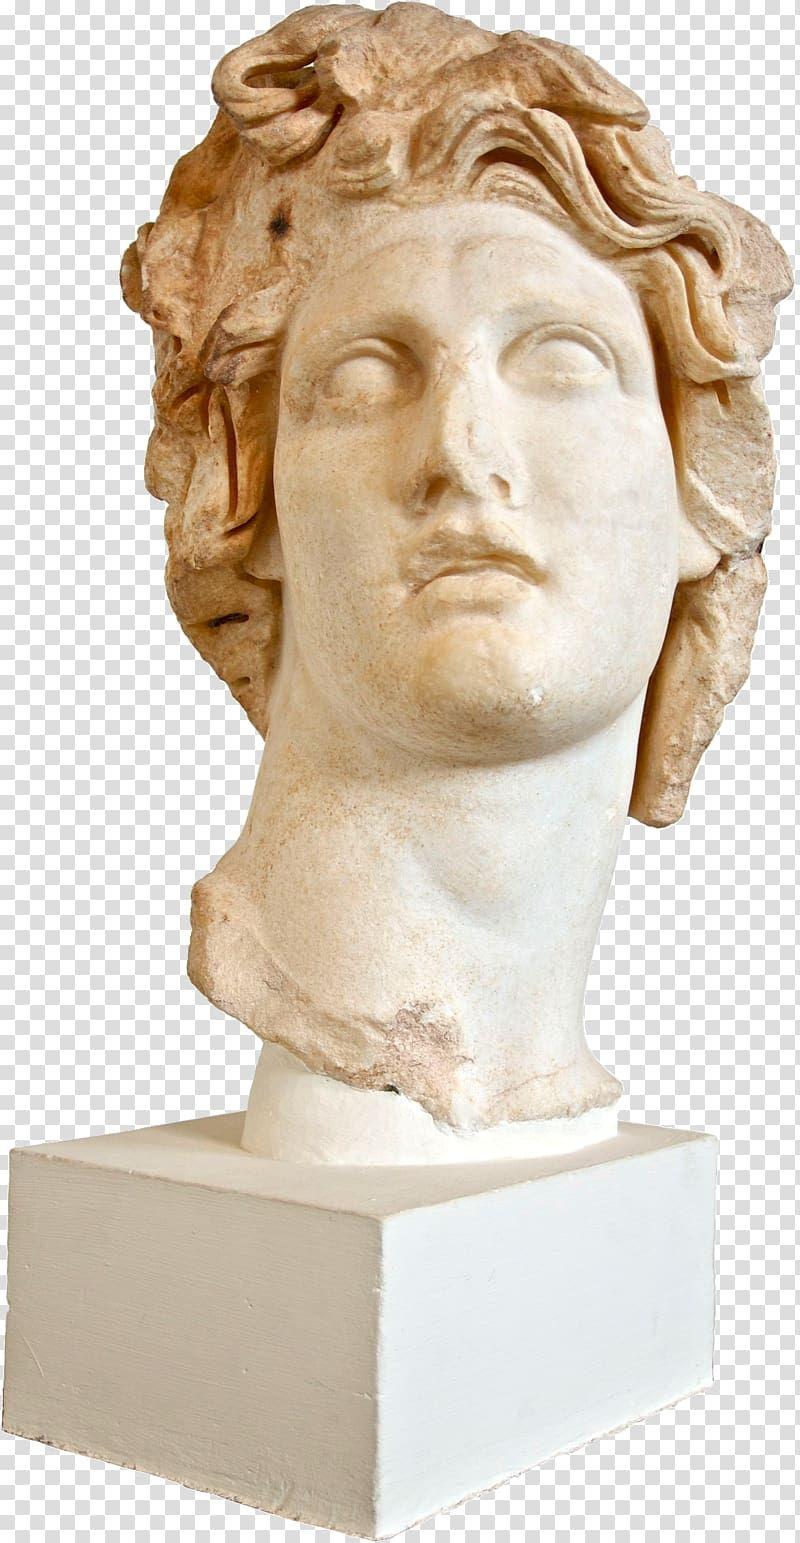 David Statue Apollo Hellenistic Period Helios Greek Mythology Solar Deity Statue Transparent Background Ancient Greek Sculpture Greek Statues Greek Sculpture